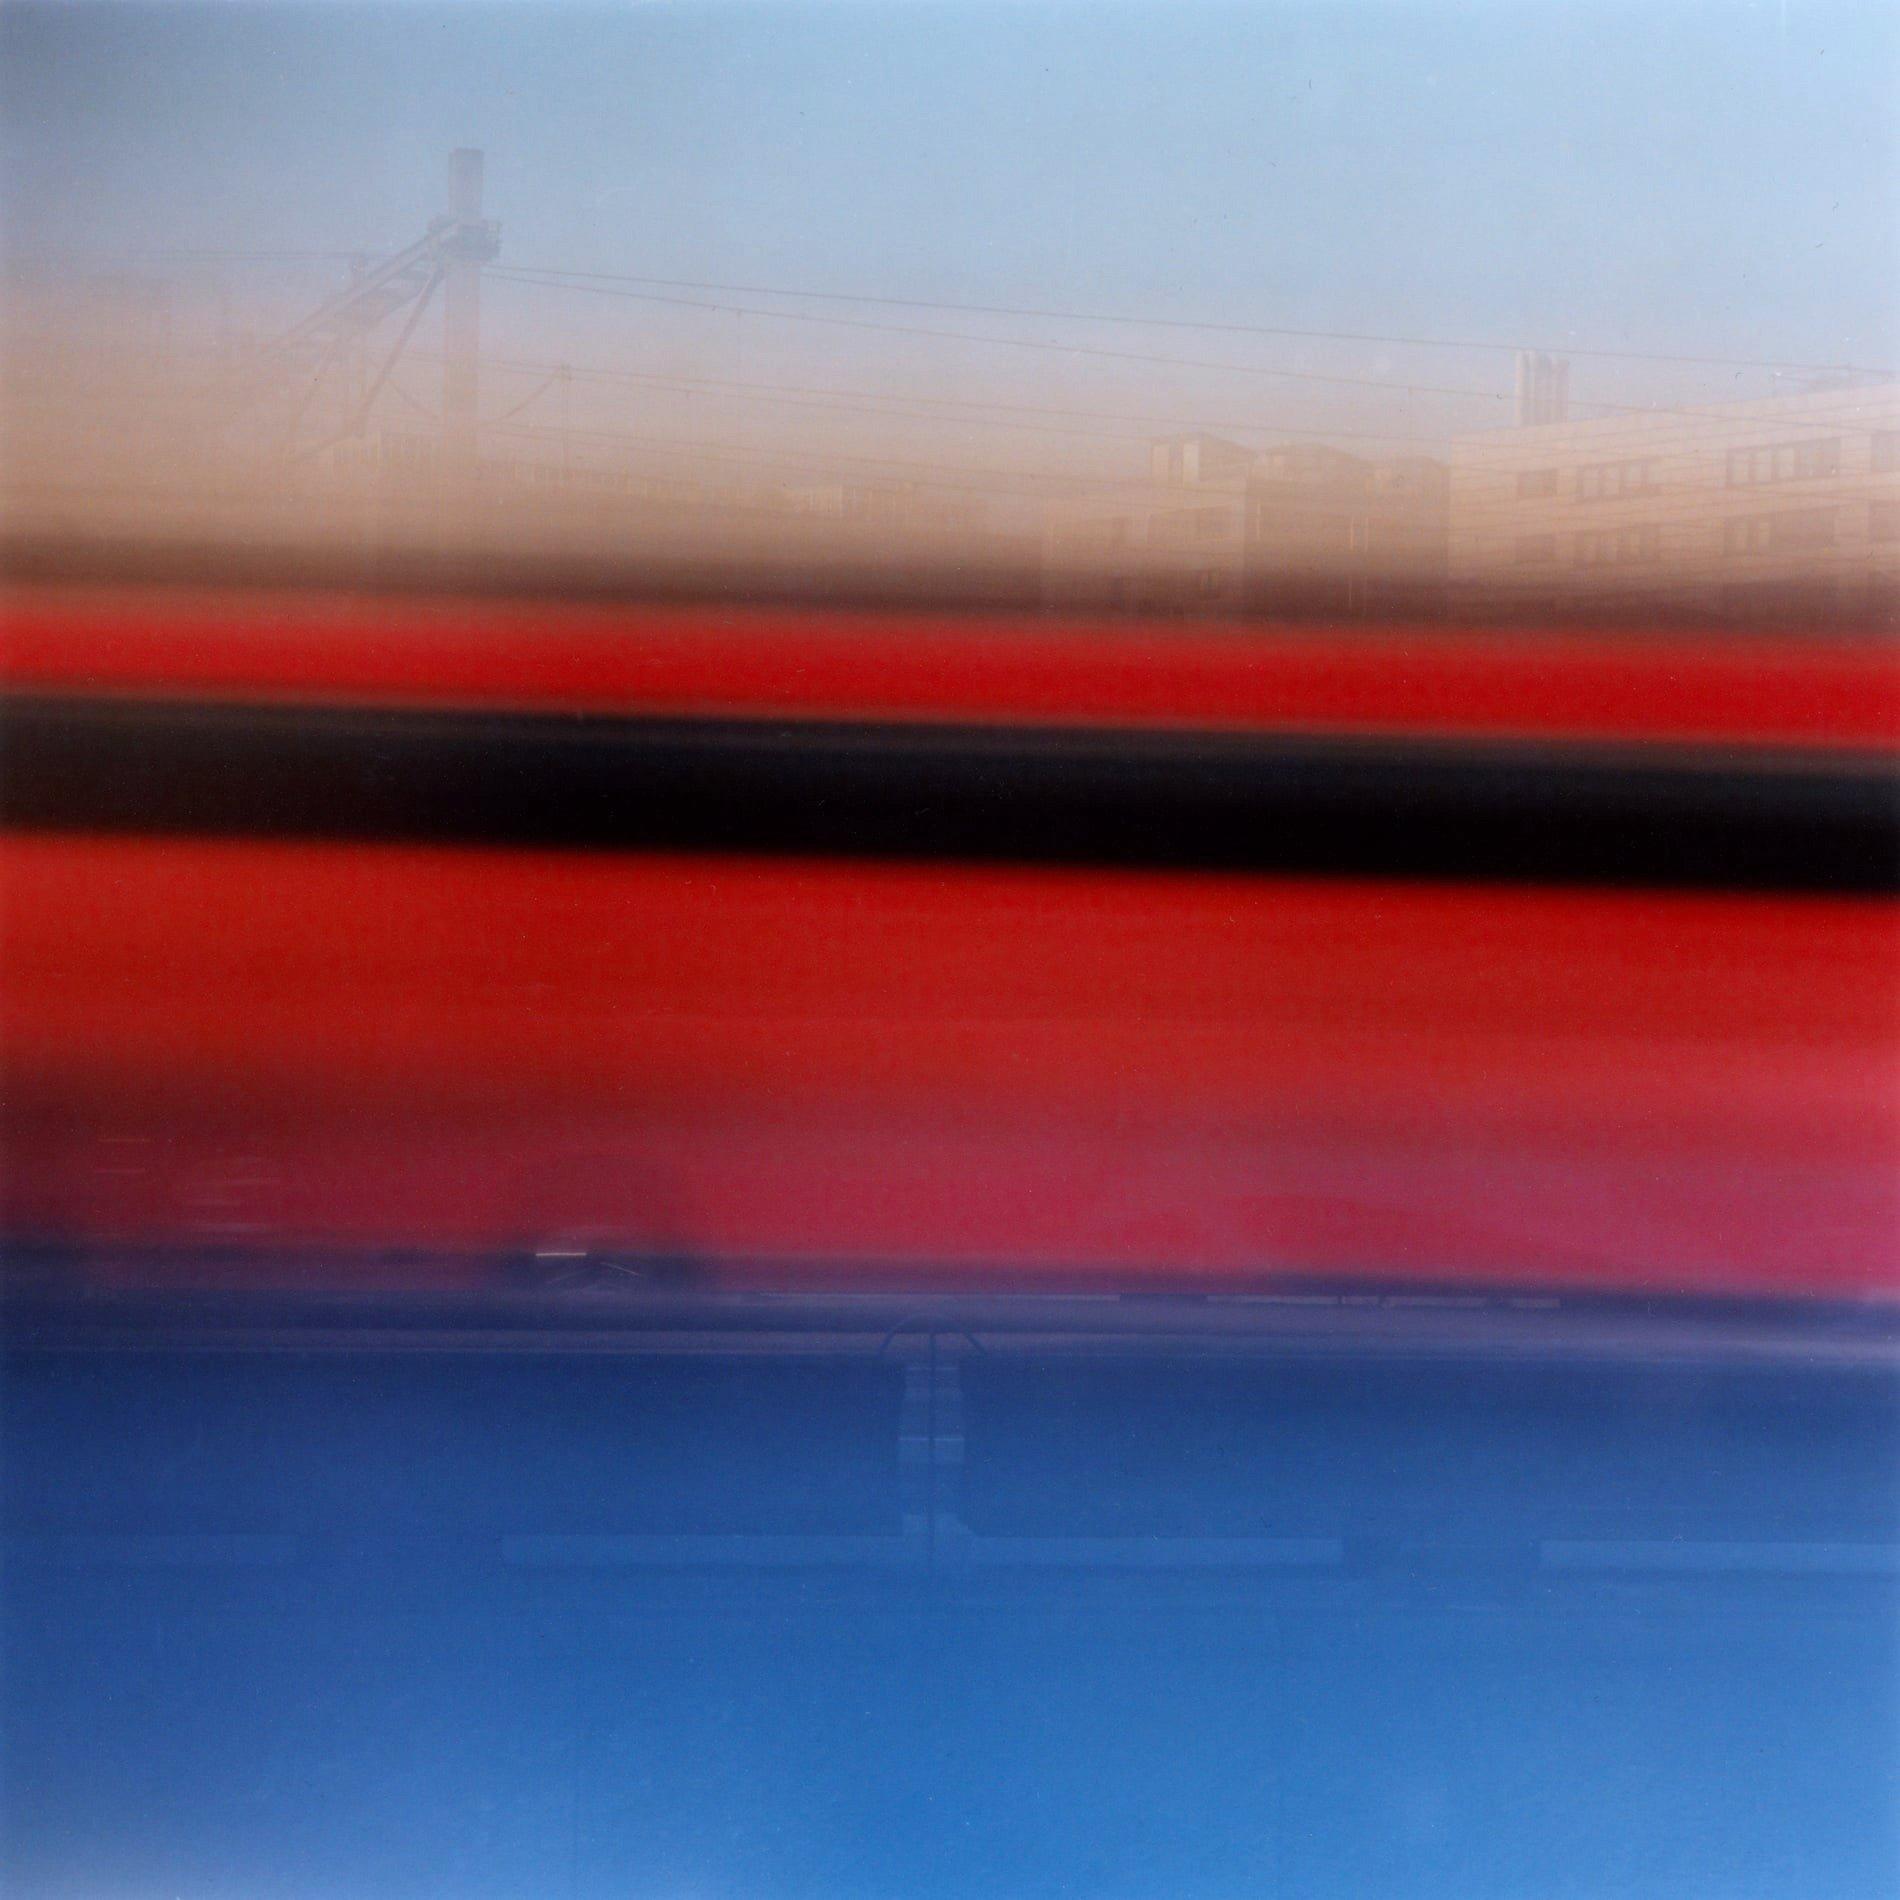 'untitled', 2019, c-print, 30x30cm